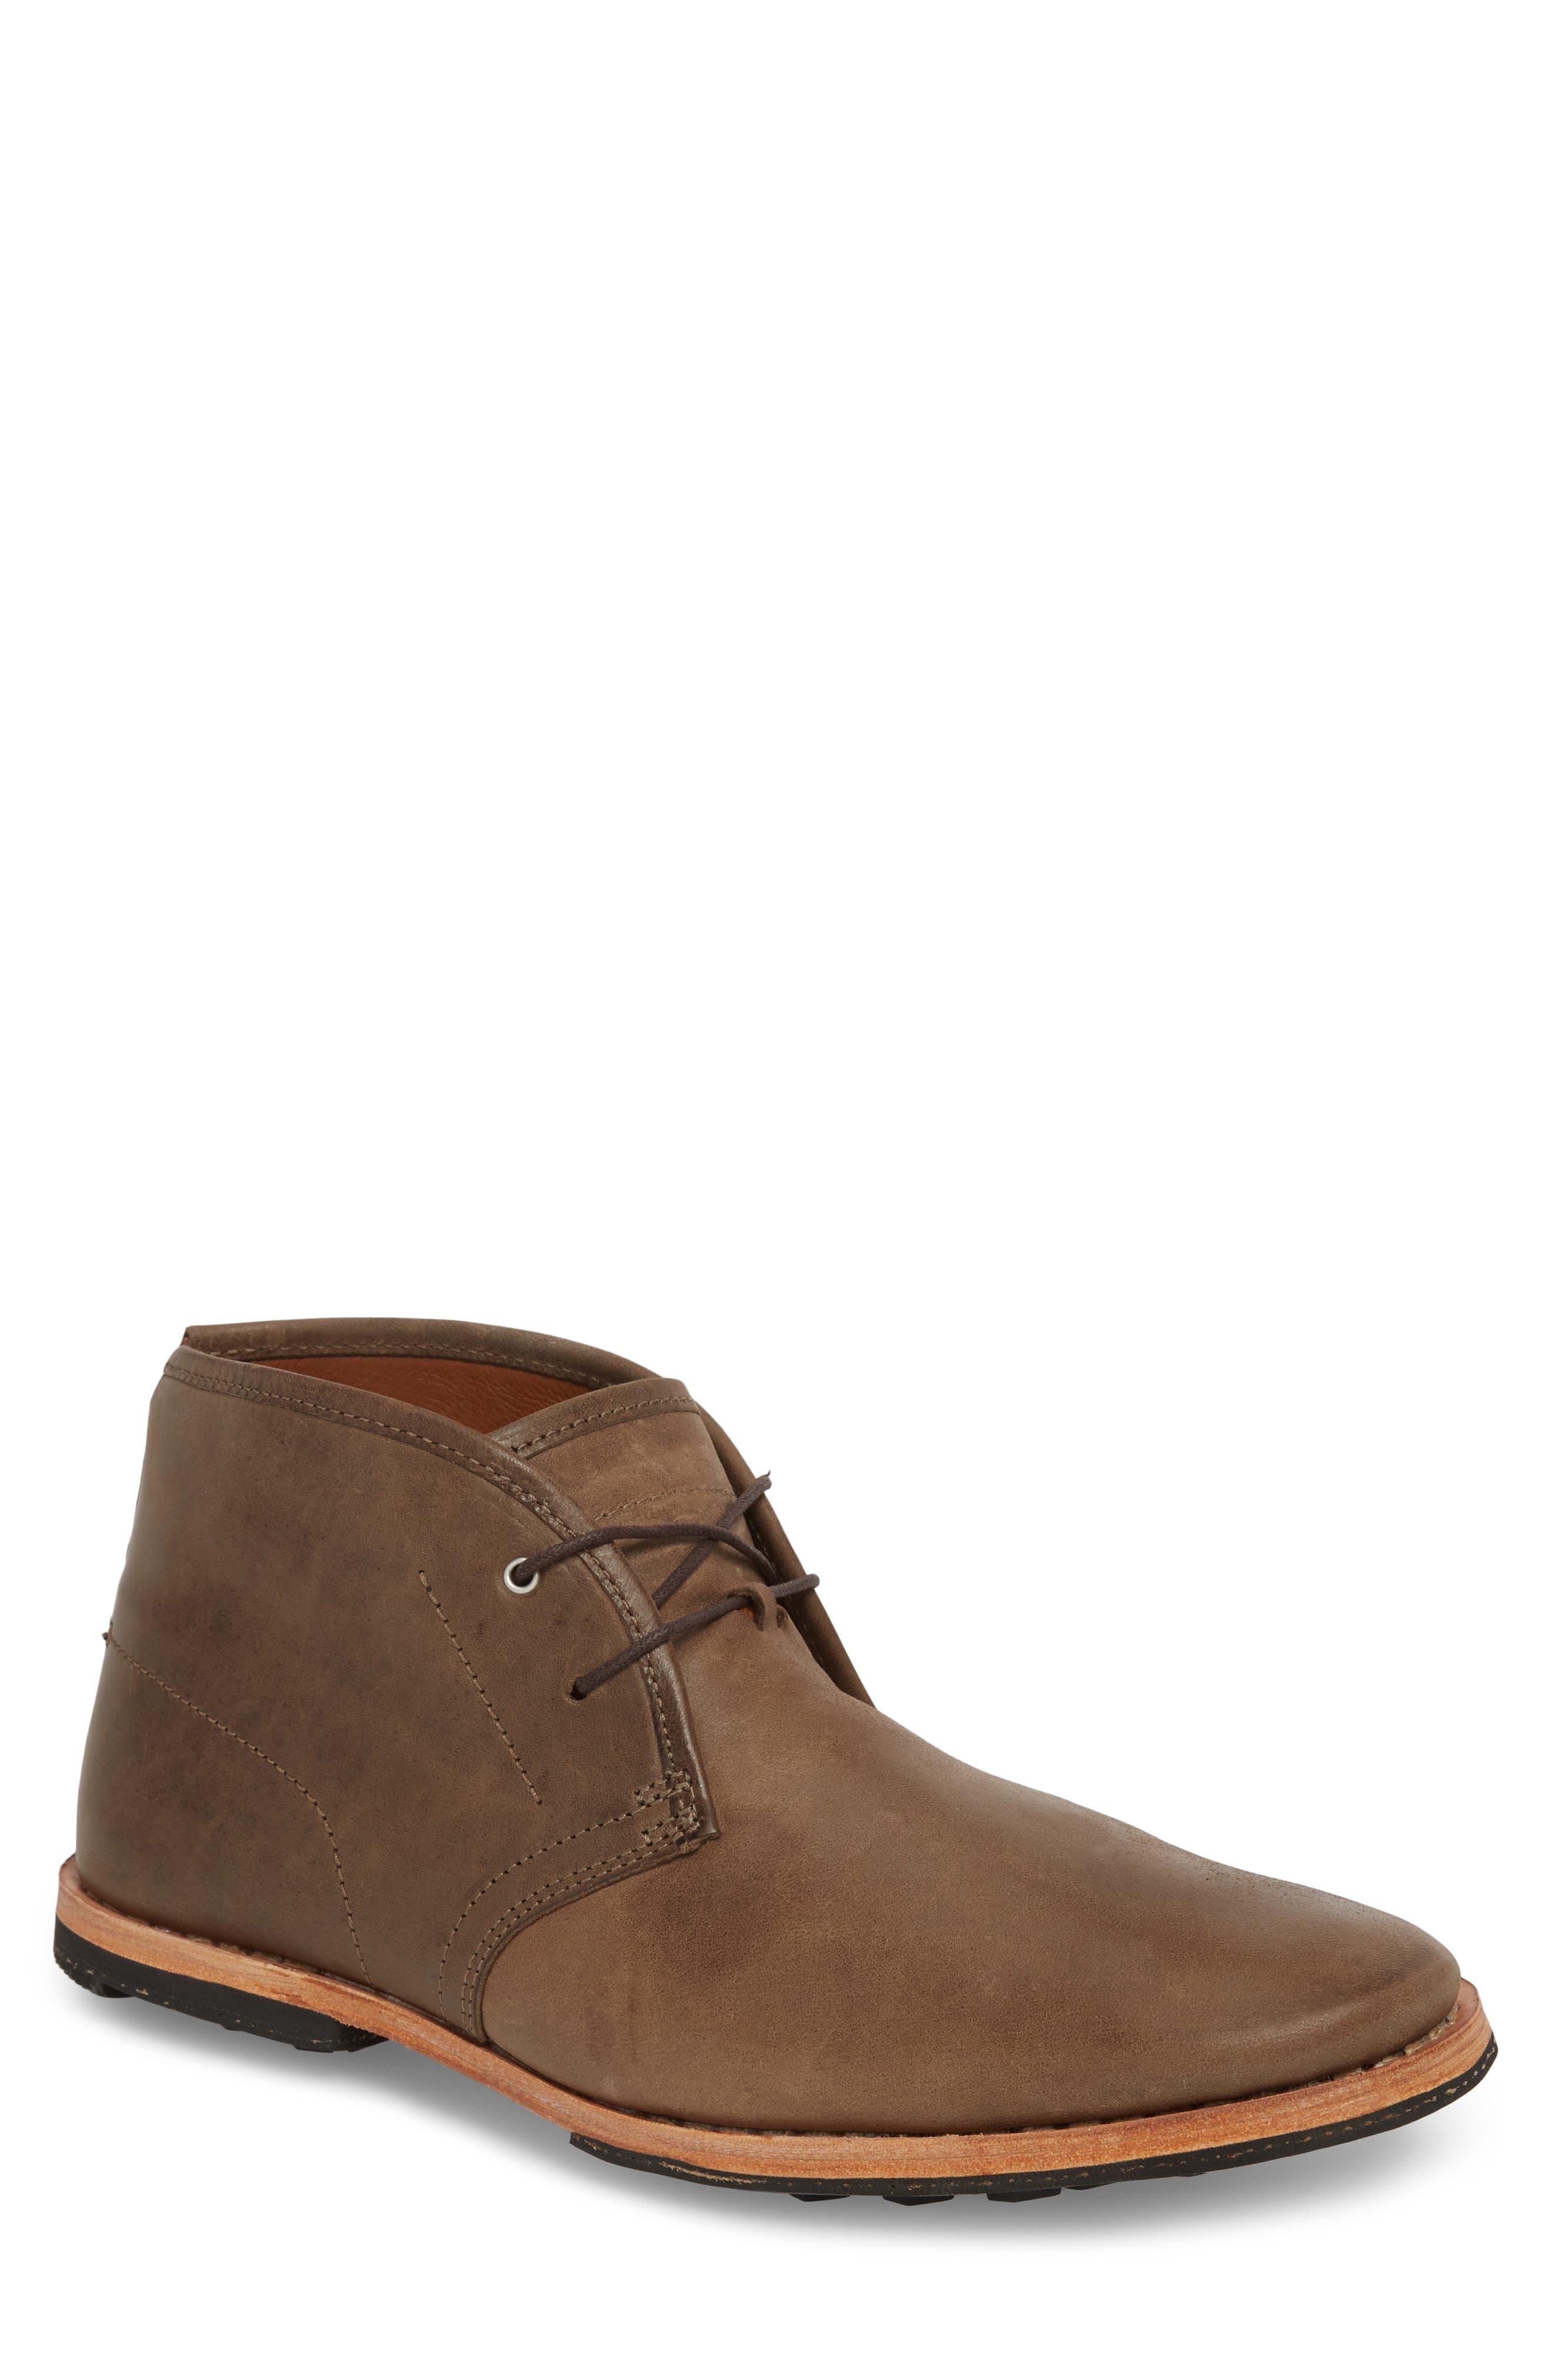 Wodehouse History Chukka Boot,                         Main,                         color, Grey Burnished Leather